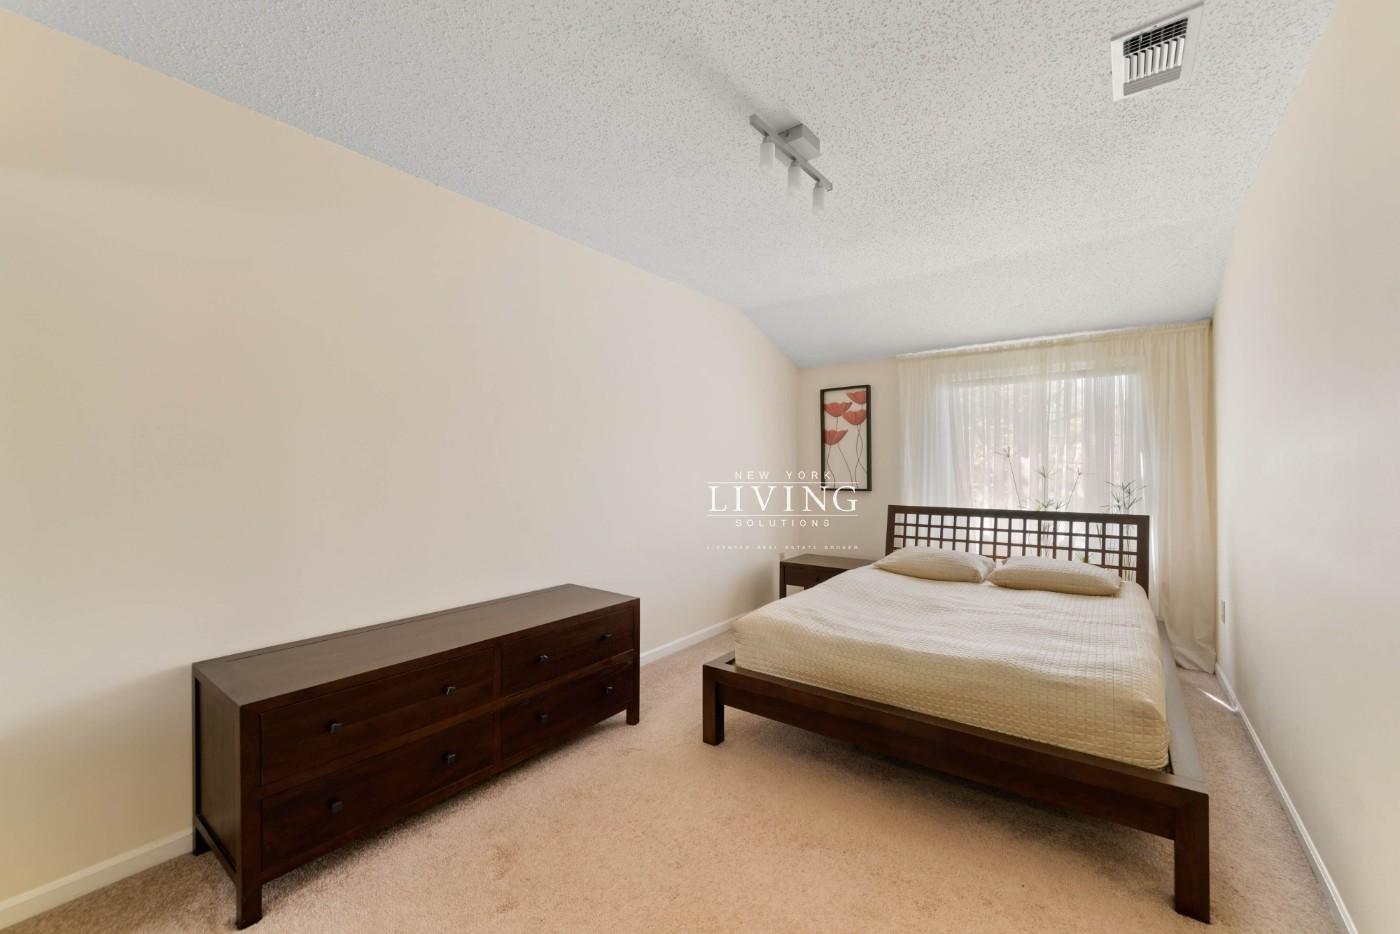 268 Ilyssa Way Staten Island Ny 10312 For Sale